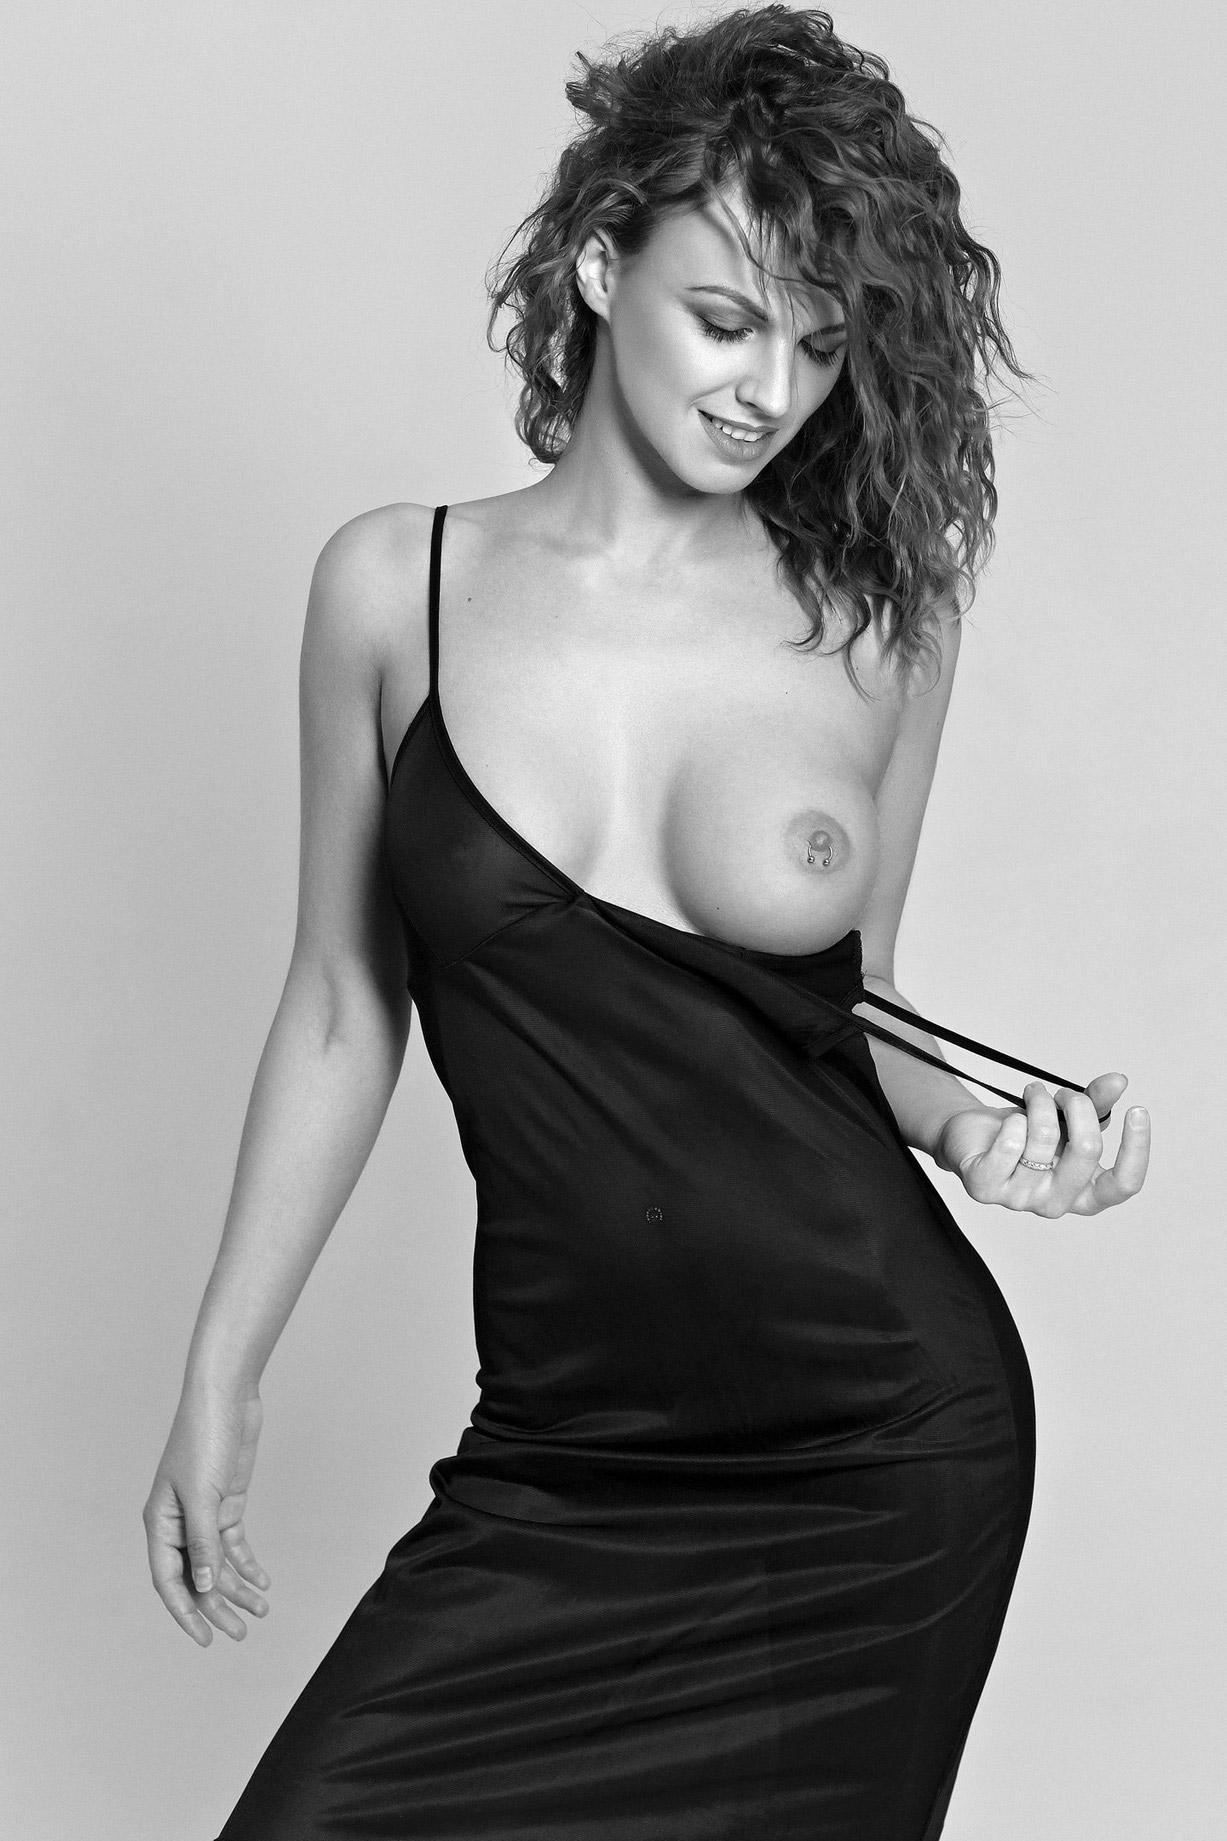 Inna Kushnir / Nessie Joy nude by Nico Pirosmani